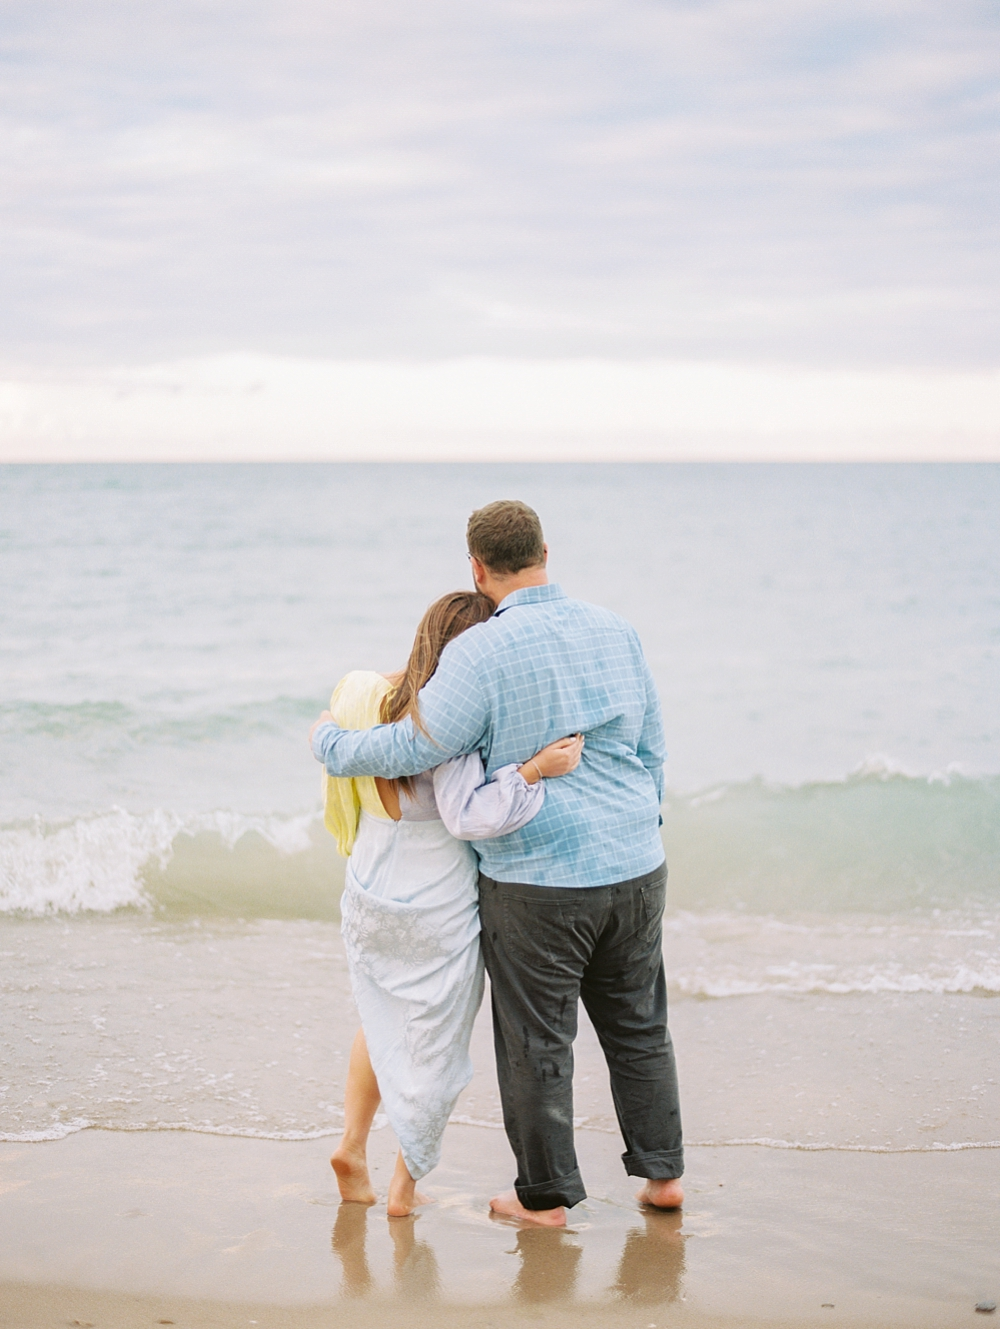 kristin-la-voie-photography-Chicago-Engagement-glencoe-beach-lake-michigan-62